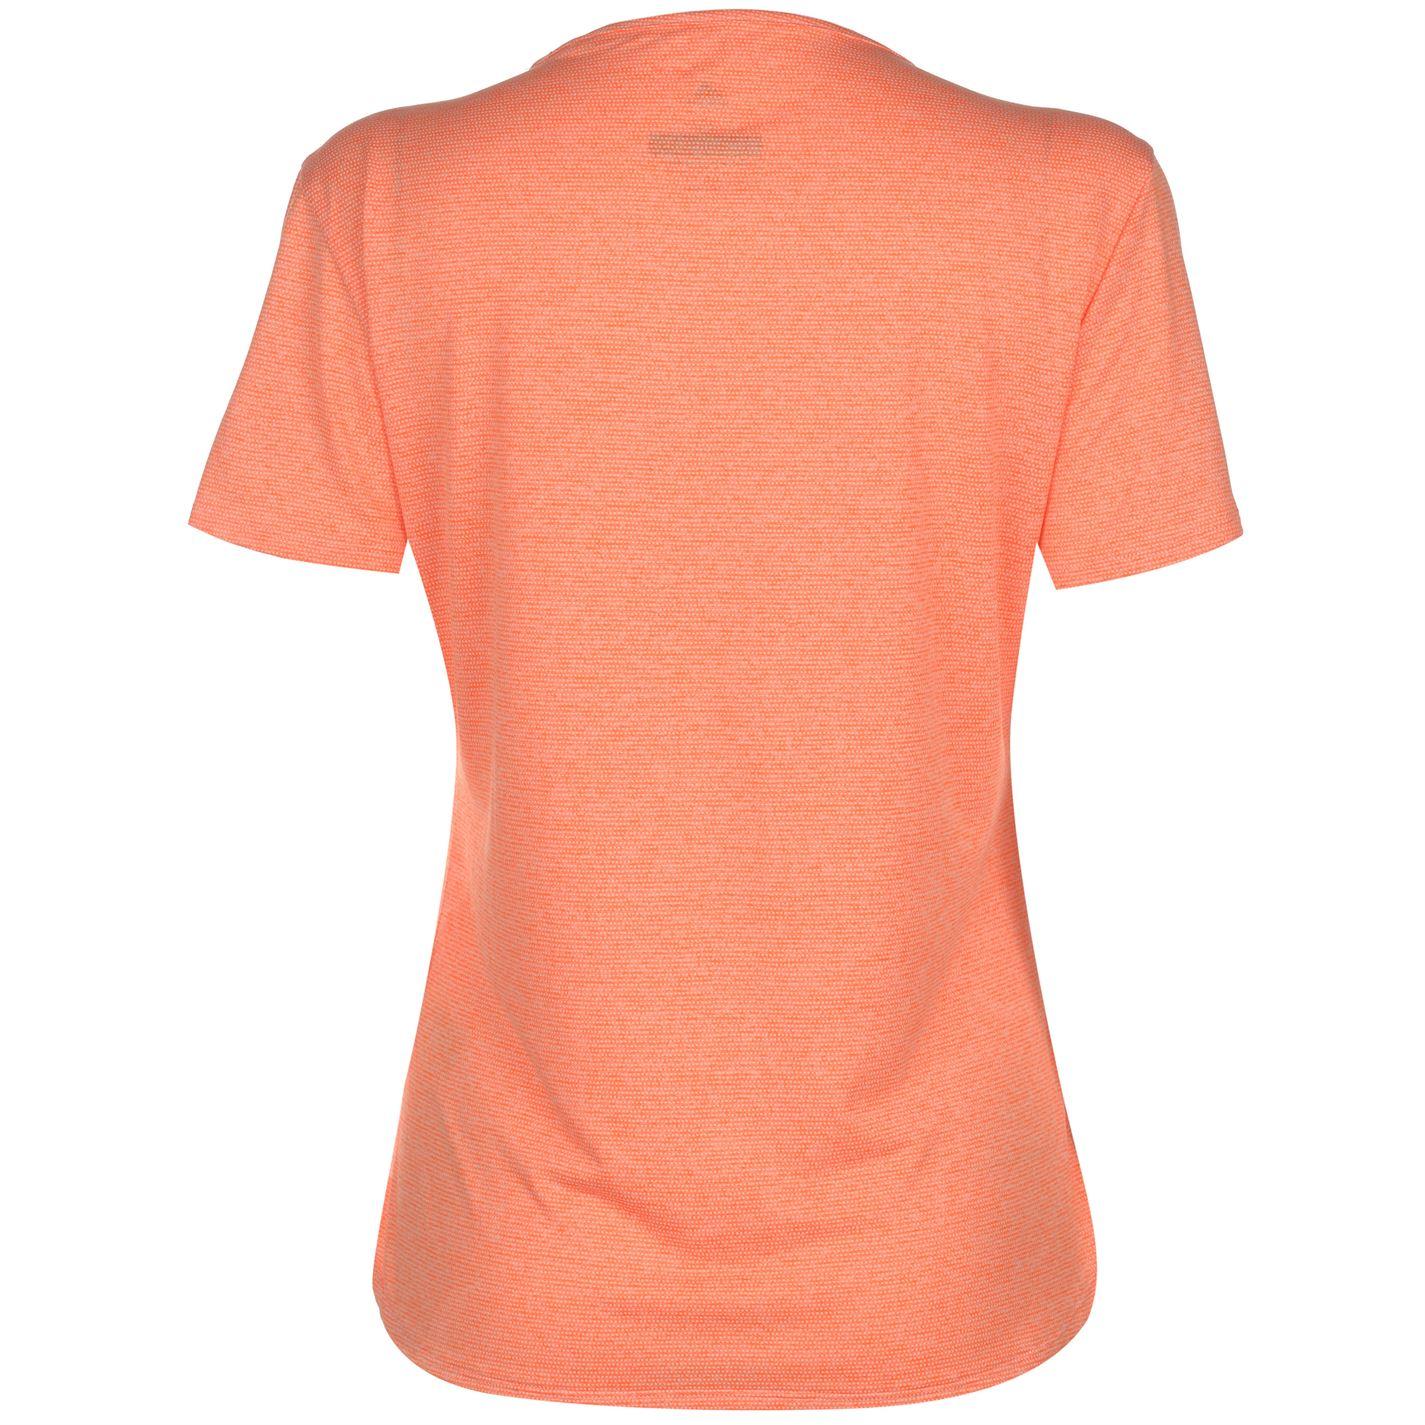 8d2ba86cf79 adidas Response Running T Shirt Ladies Short Sleeve Performance Tee ...